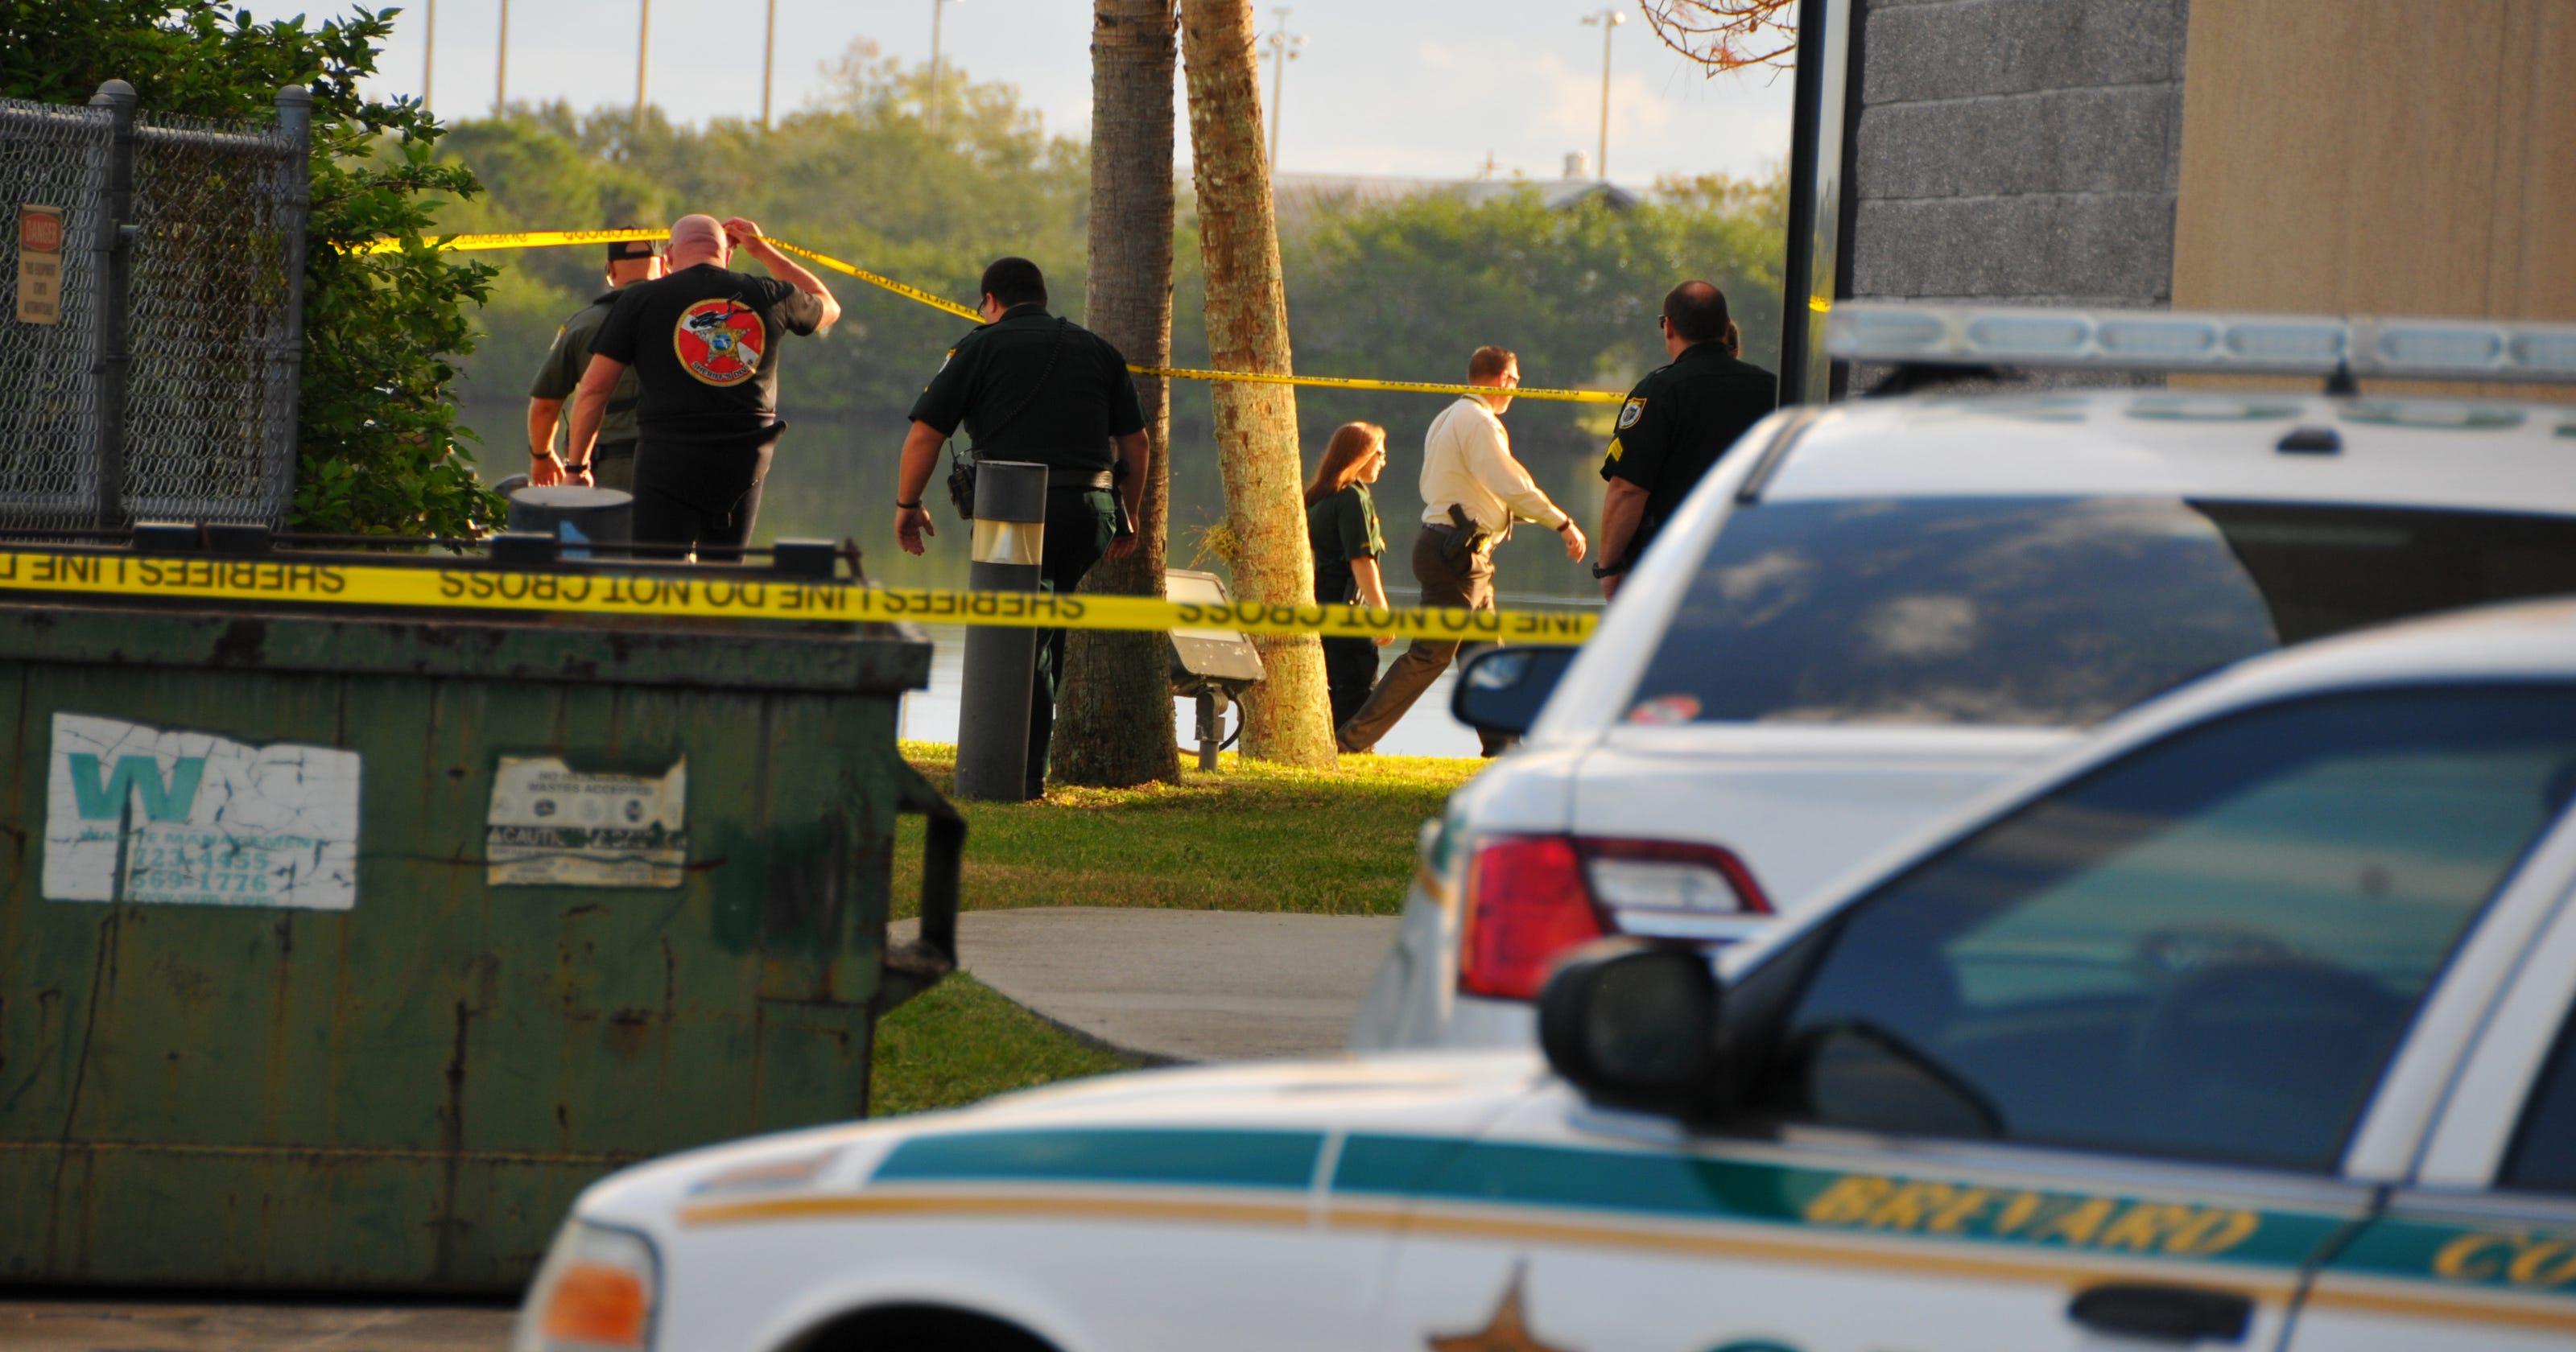 No more arrest mugshot galleries: FLORIDA TODAY won't publish this